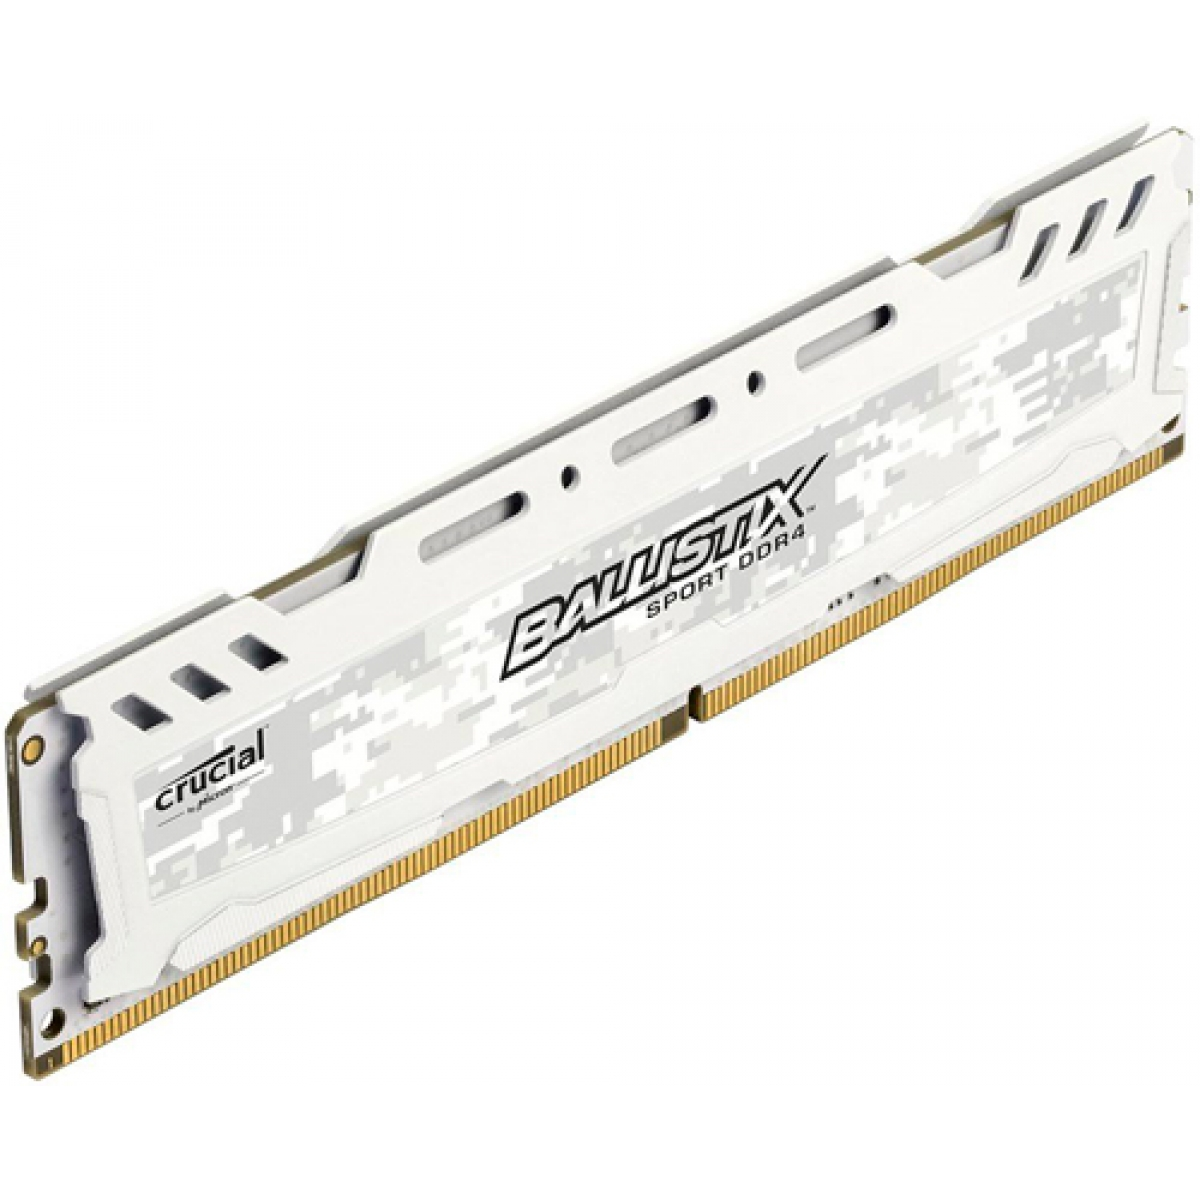 Memória DDR4 Crucial Ballistix Sport Lt, 16GB 2400MHz, White, BLS16G4D240FSC